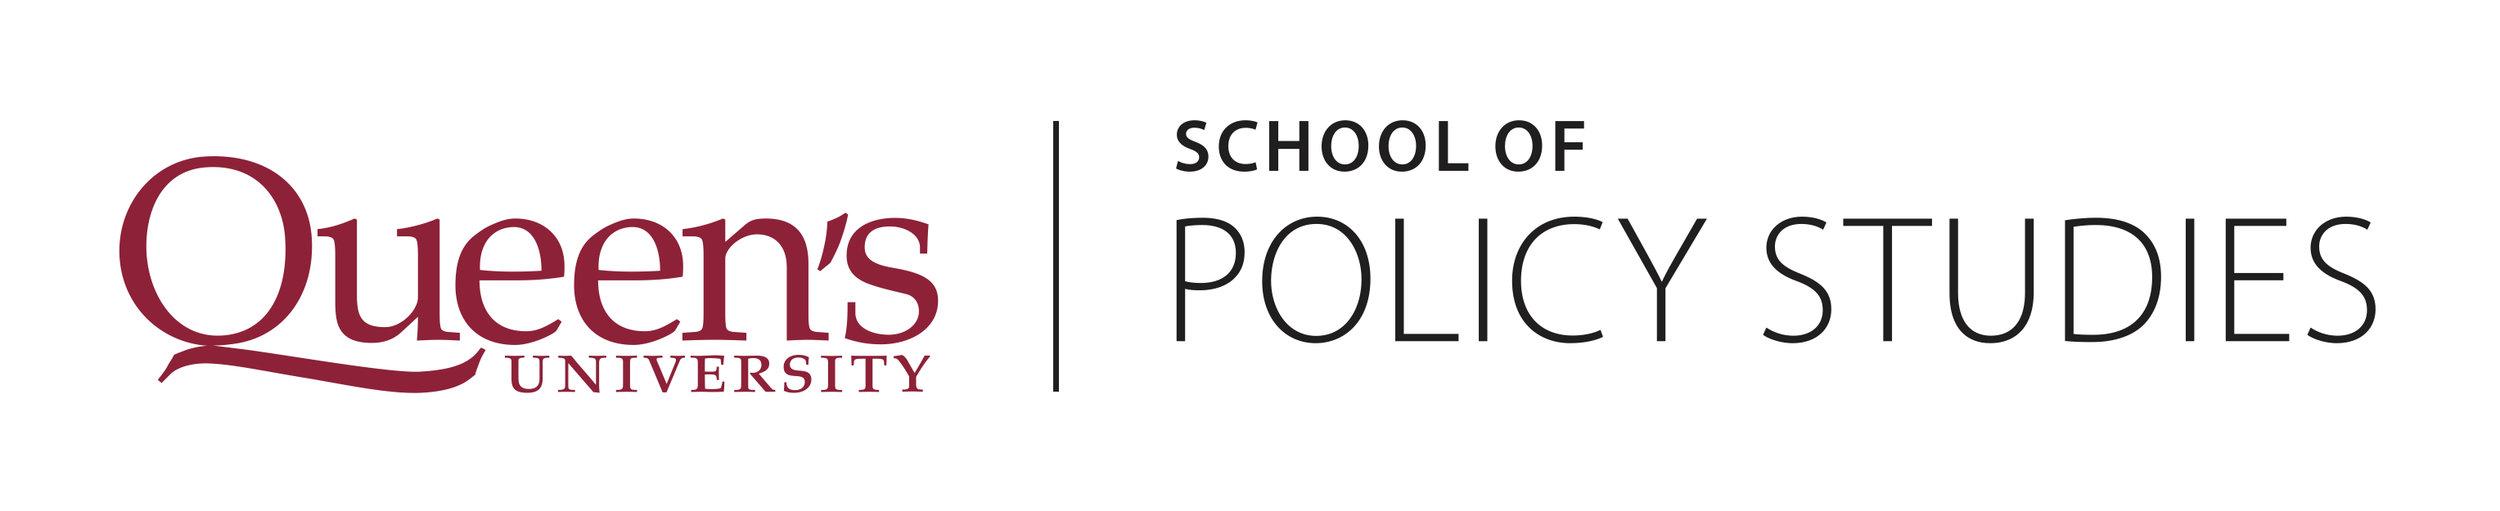 unit signature Policy Studies red-black.jpg